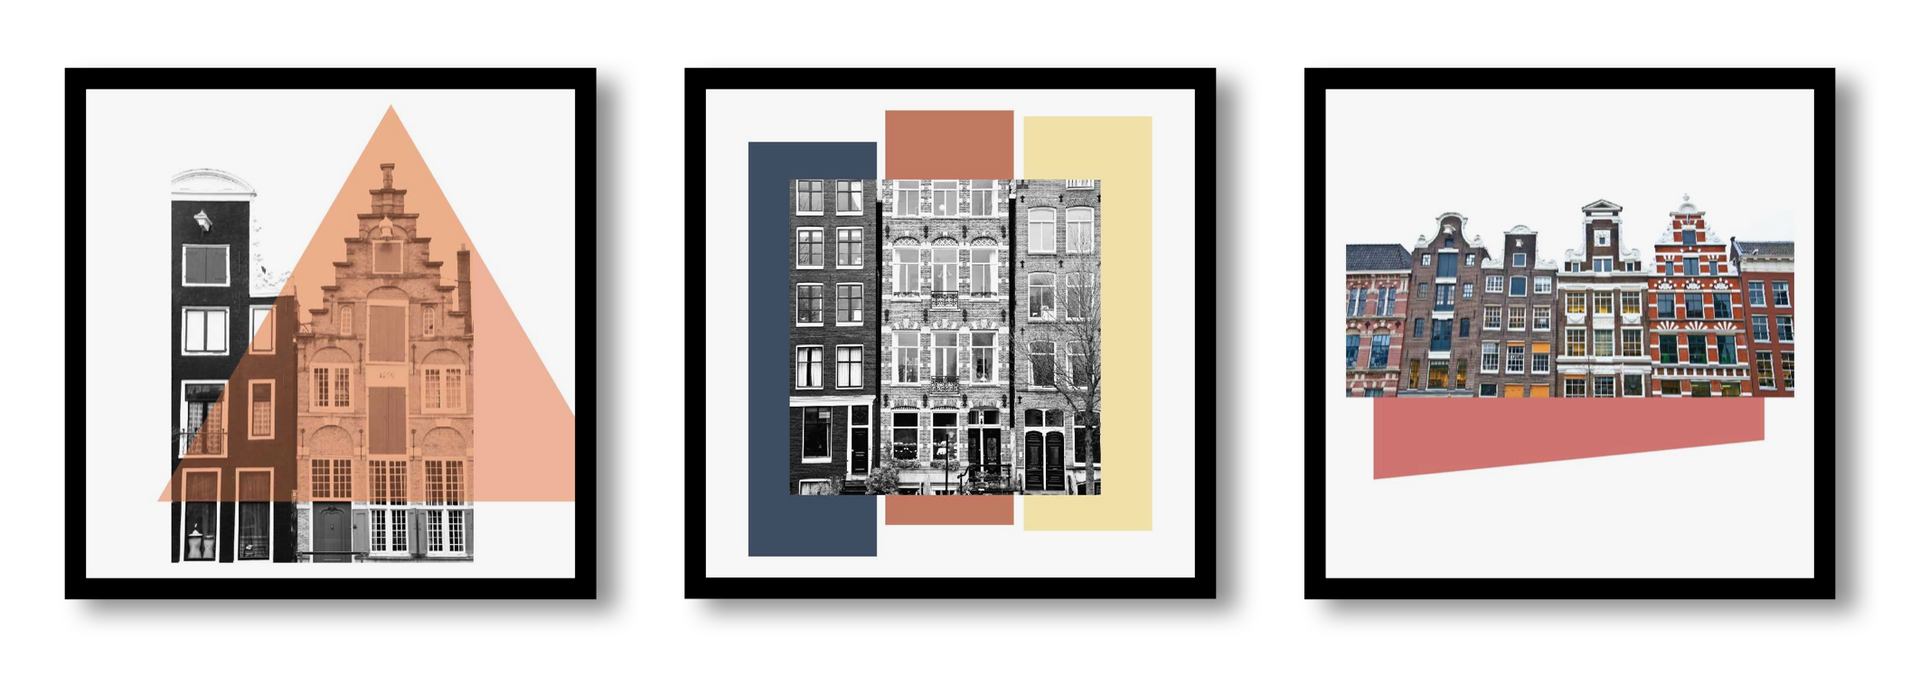 Amsterdam Digital Art Series